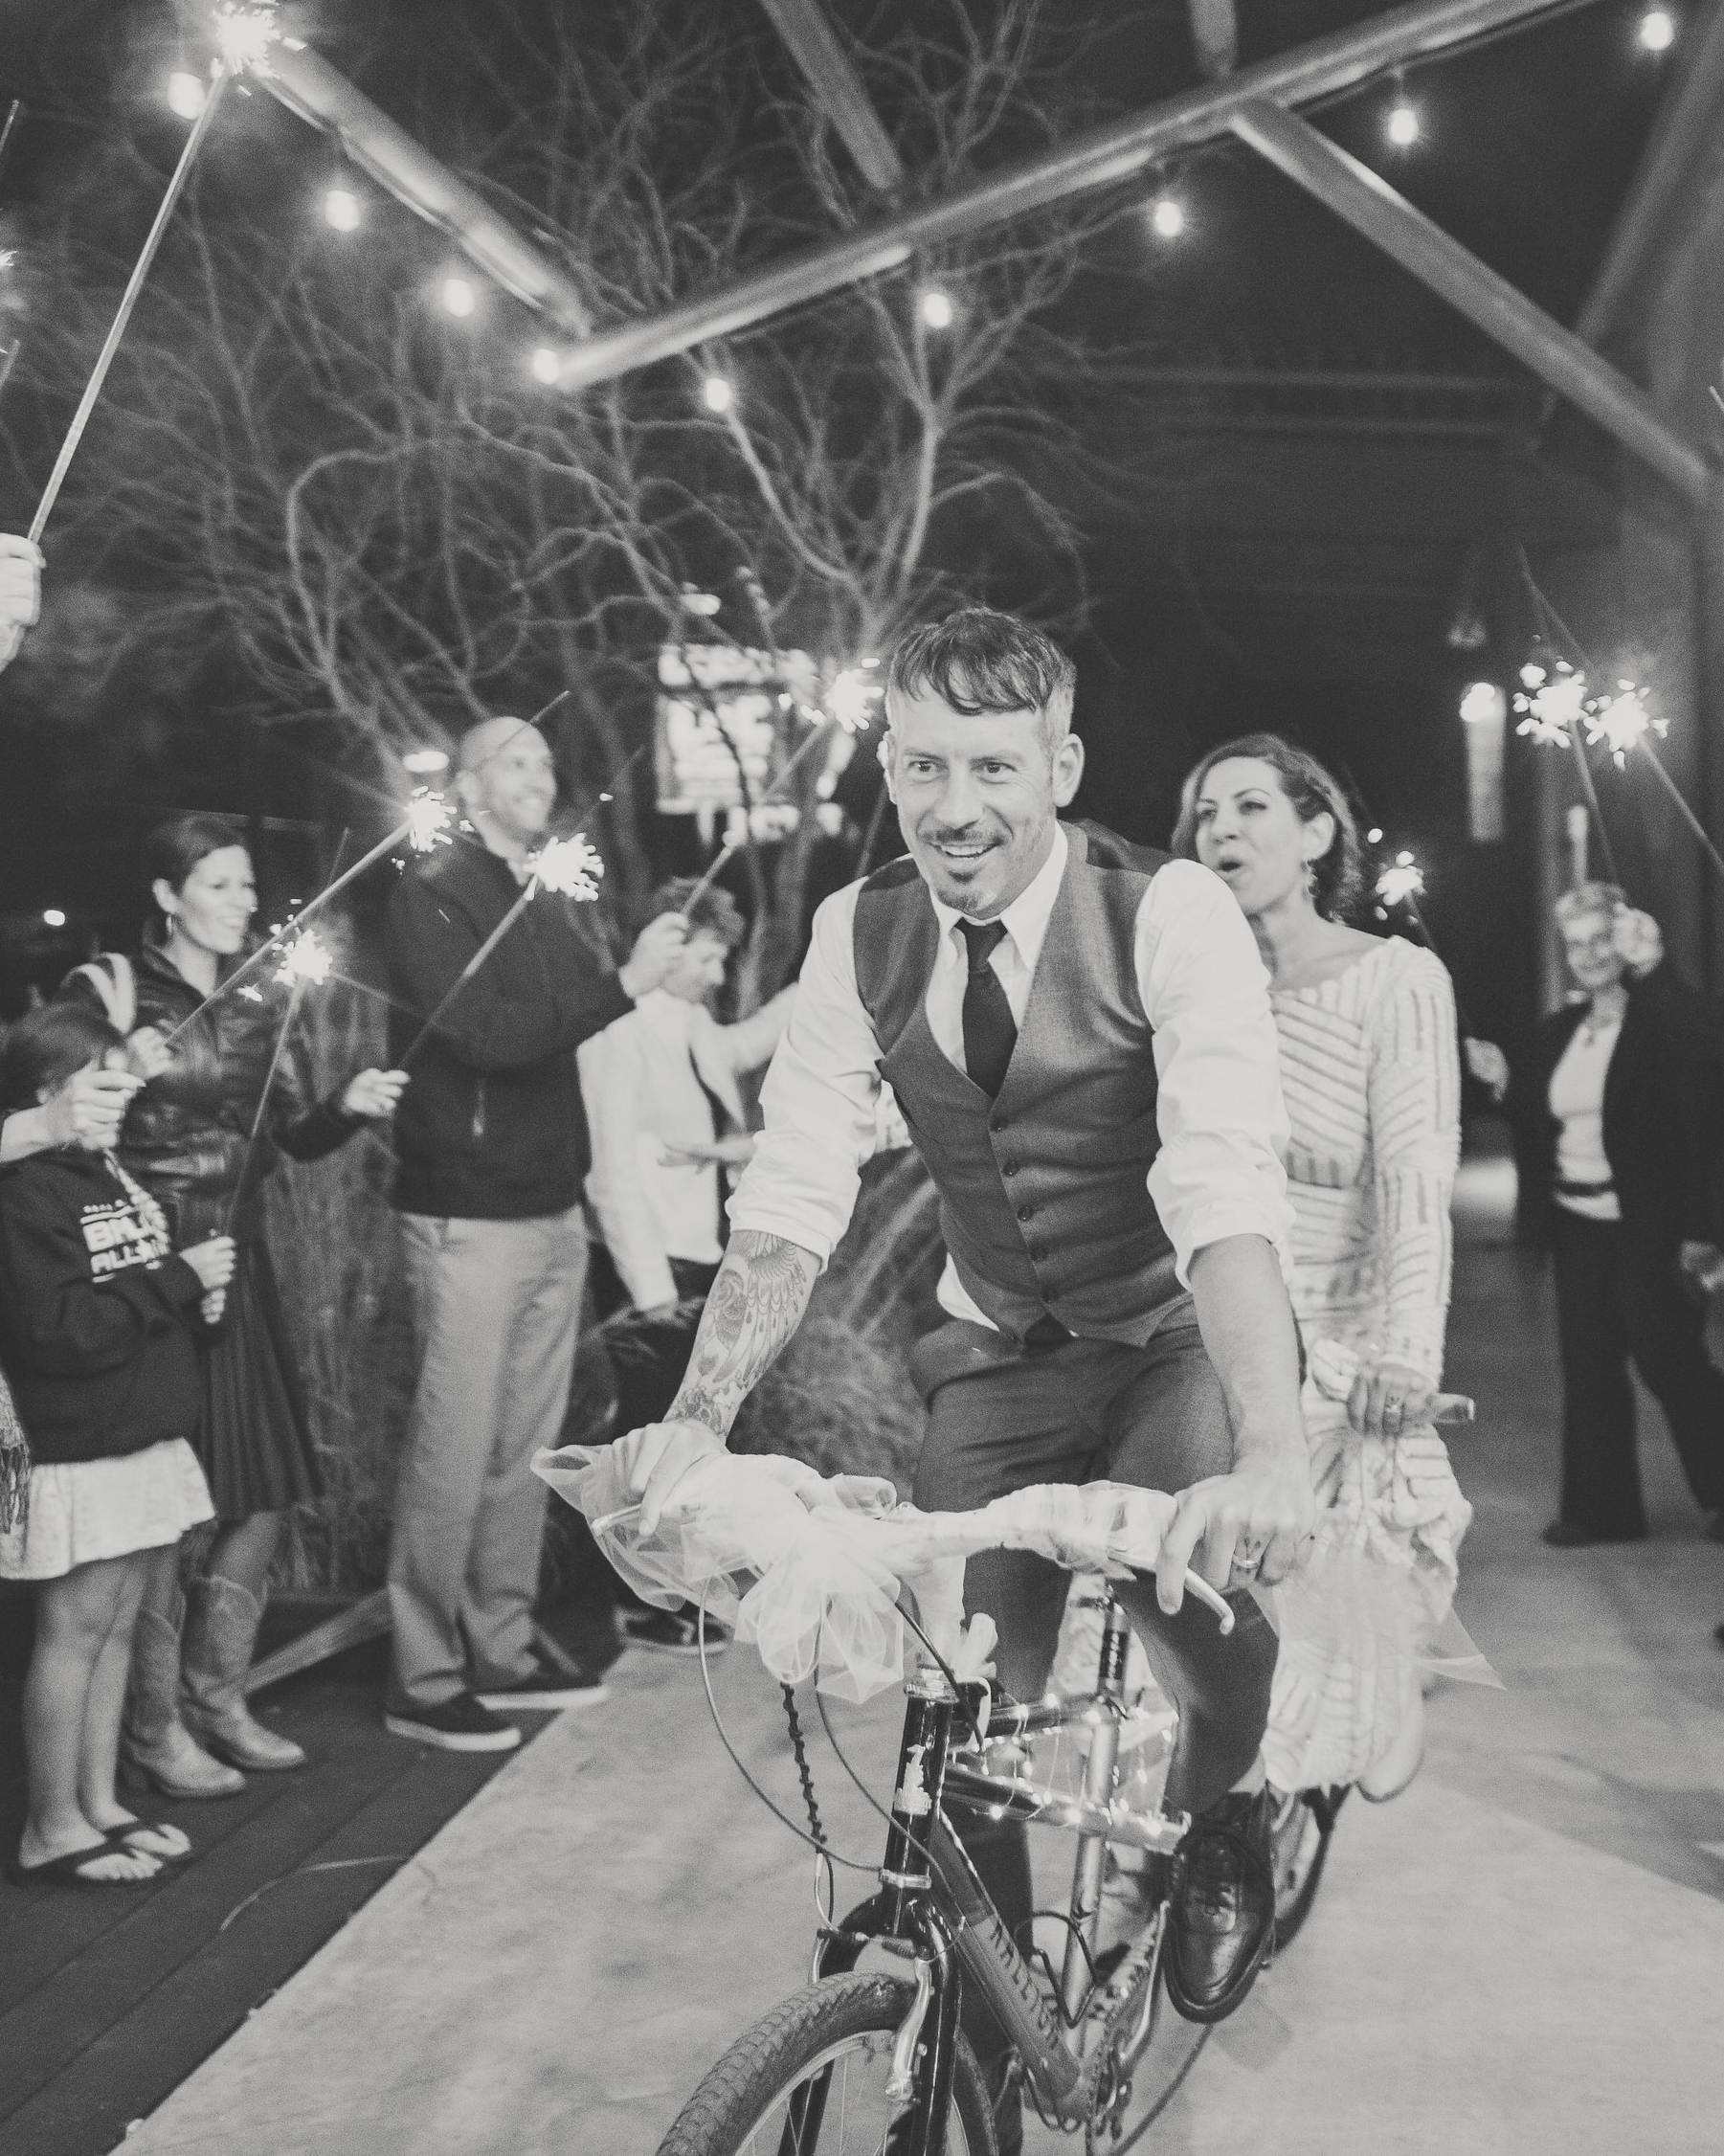 lara-chad-wedding-sparklers-935-s112306-1115.jpg